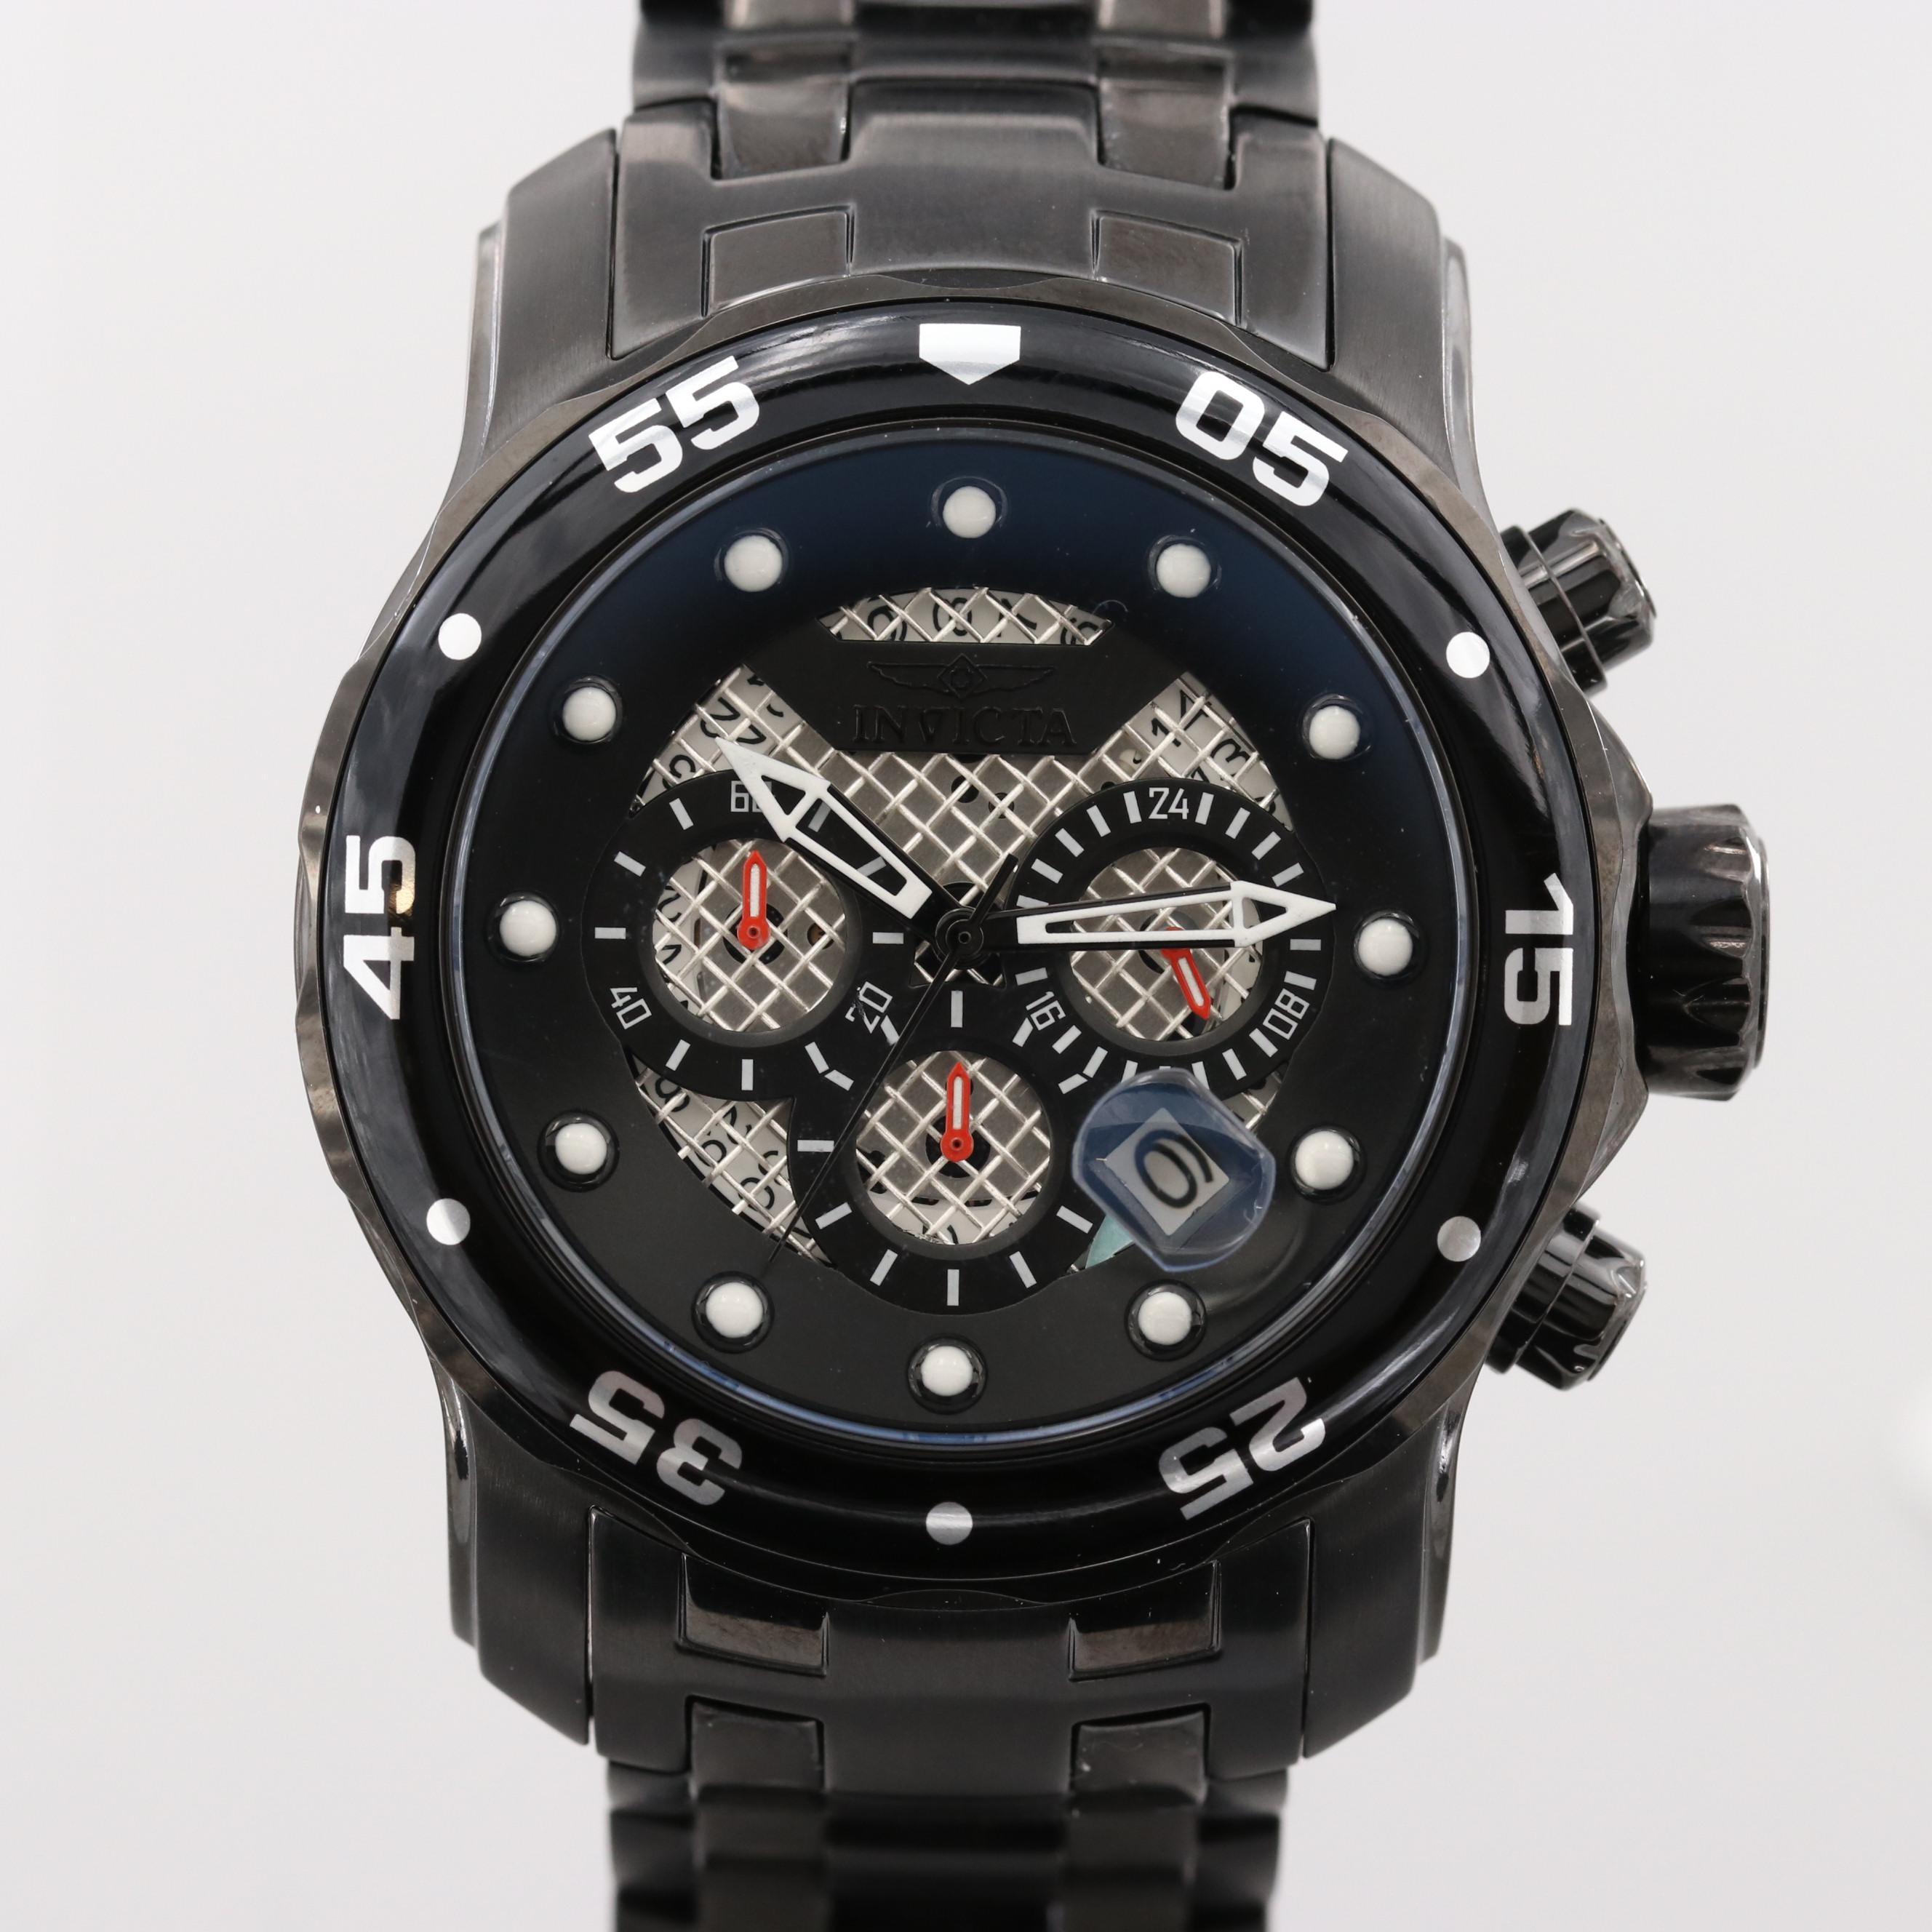 Invicta Pro Diver Stainless Steel Chronograph Quartz Wristwatch